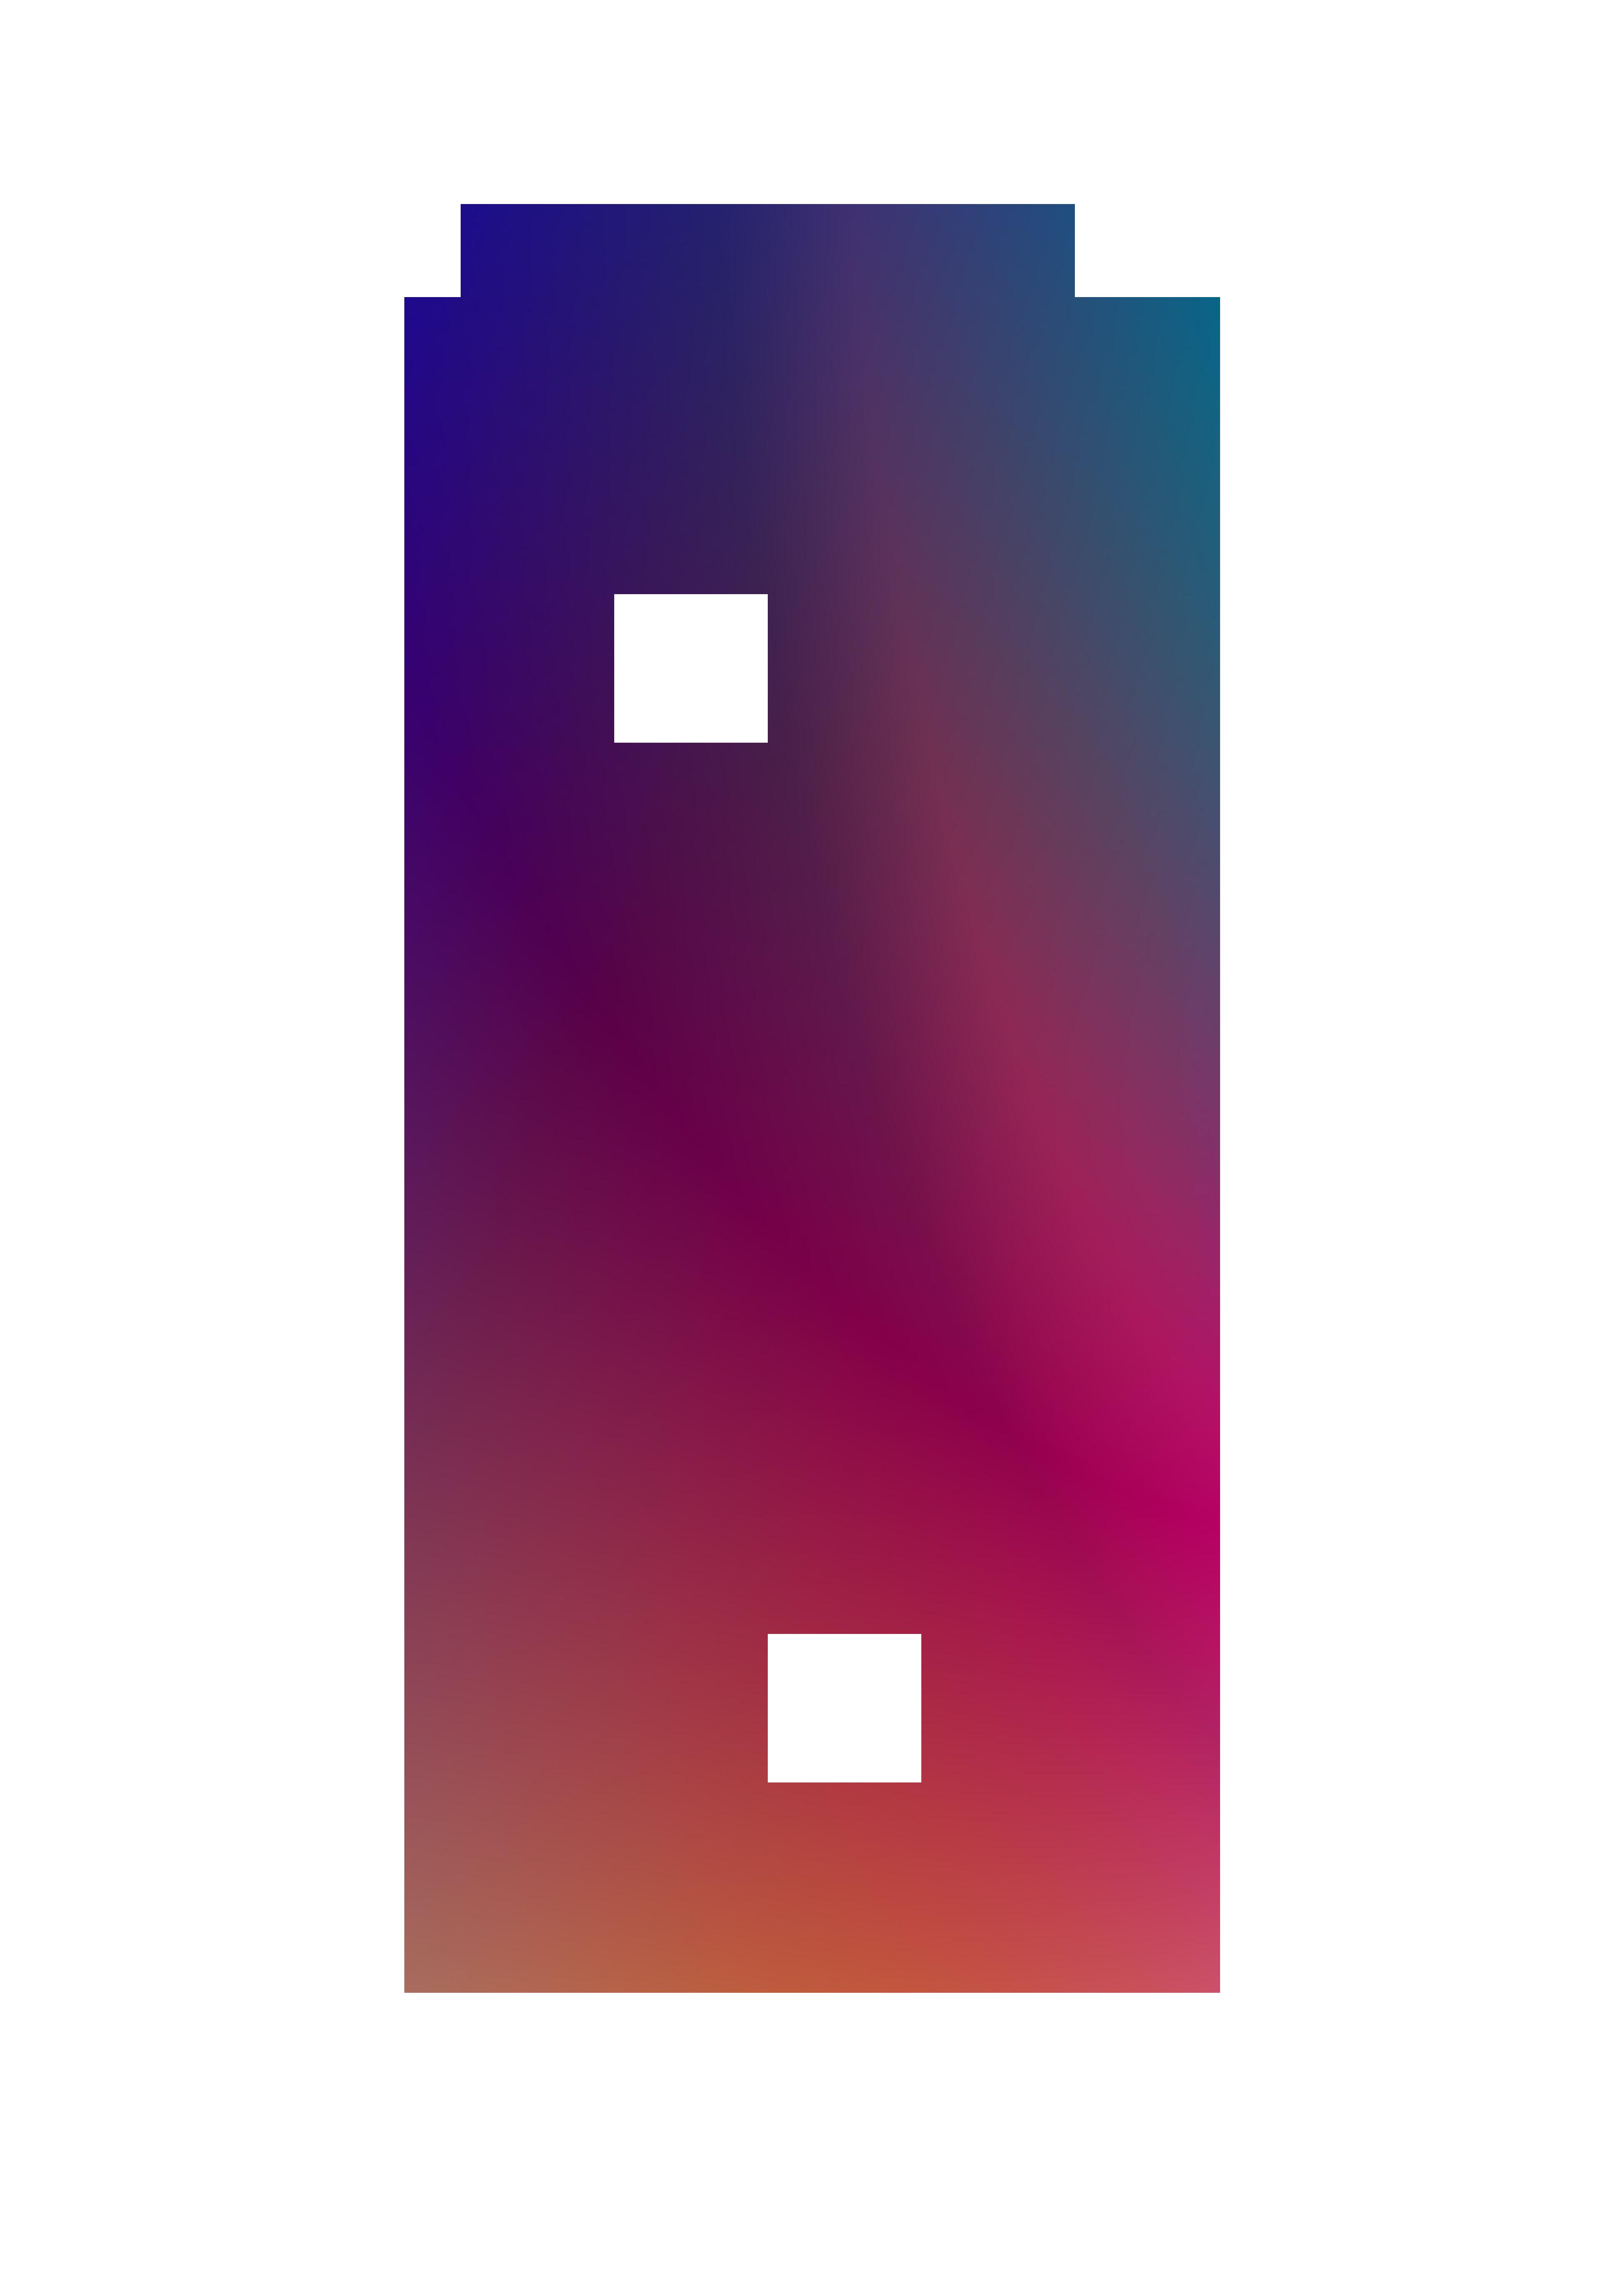 Batterie-Management-Systemen